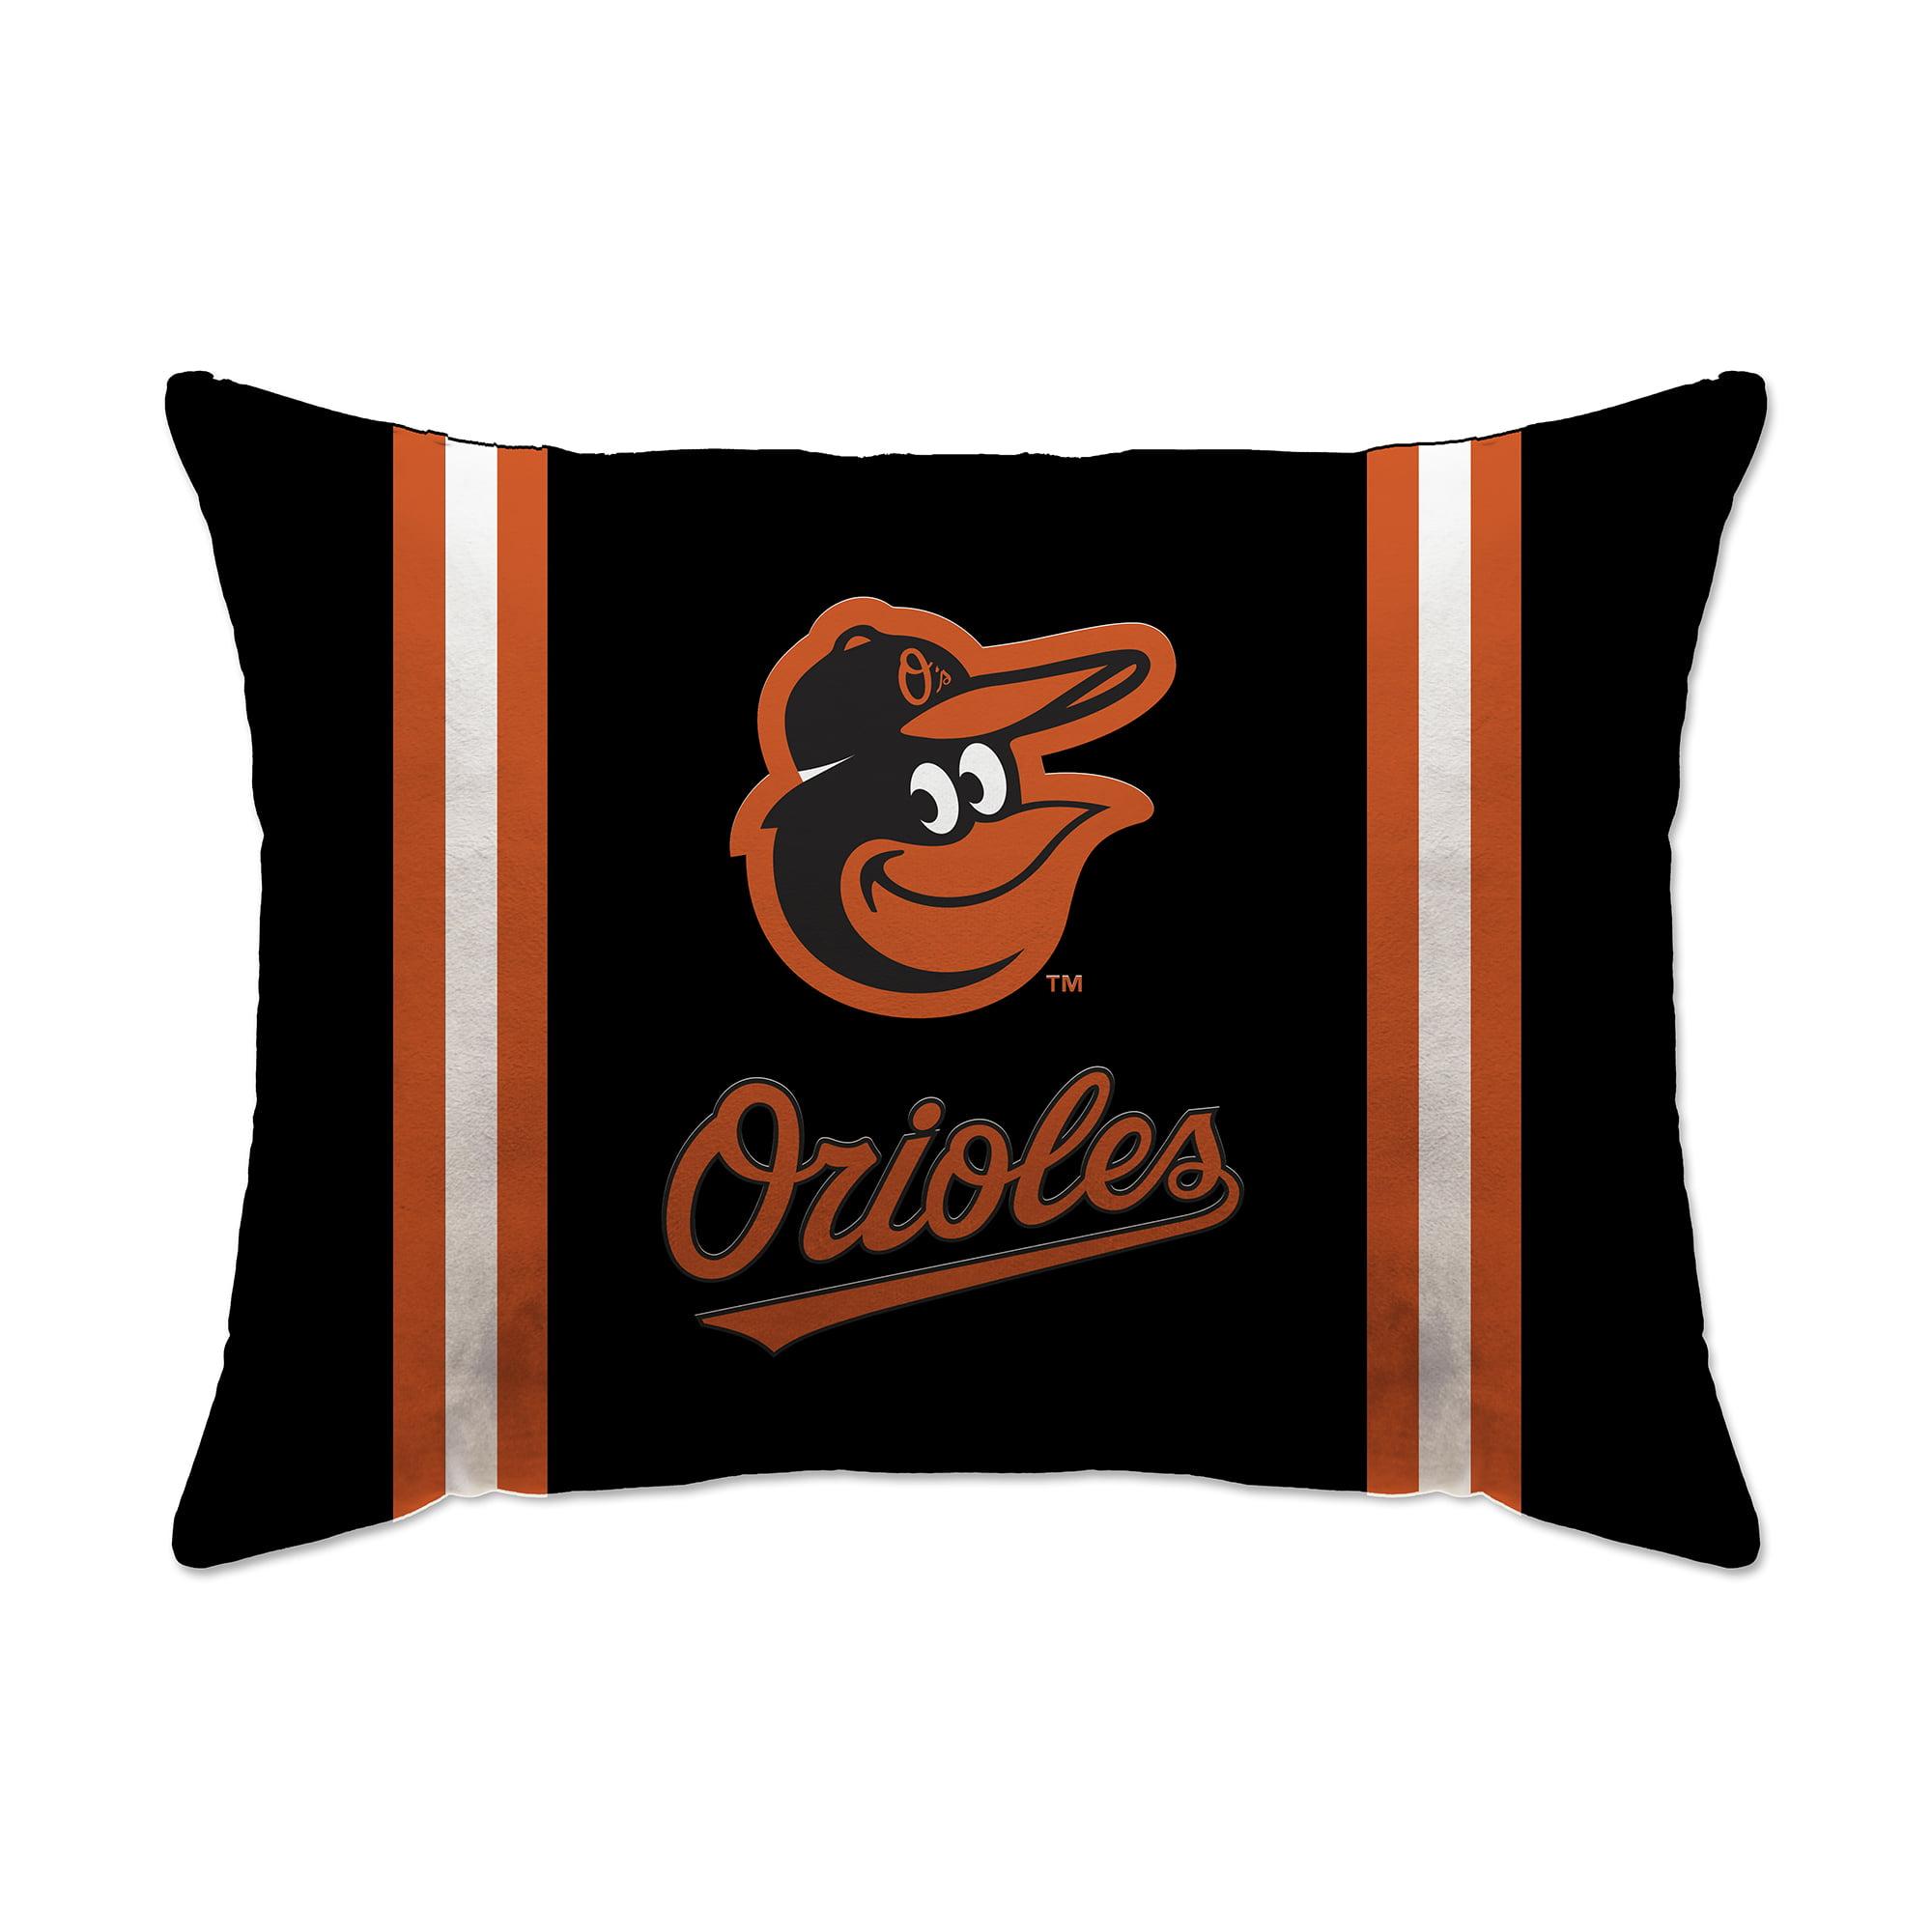 "Baltimore Orioles 20"" x 26"" Plush Bed Pillow - Black - No Size"